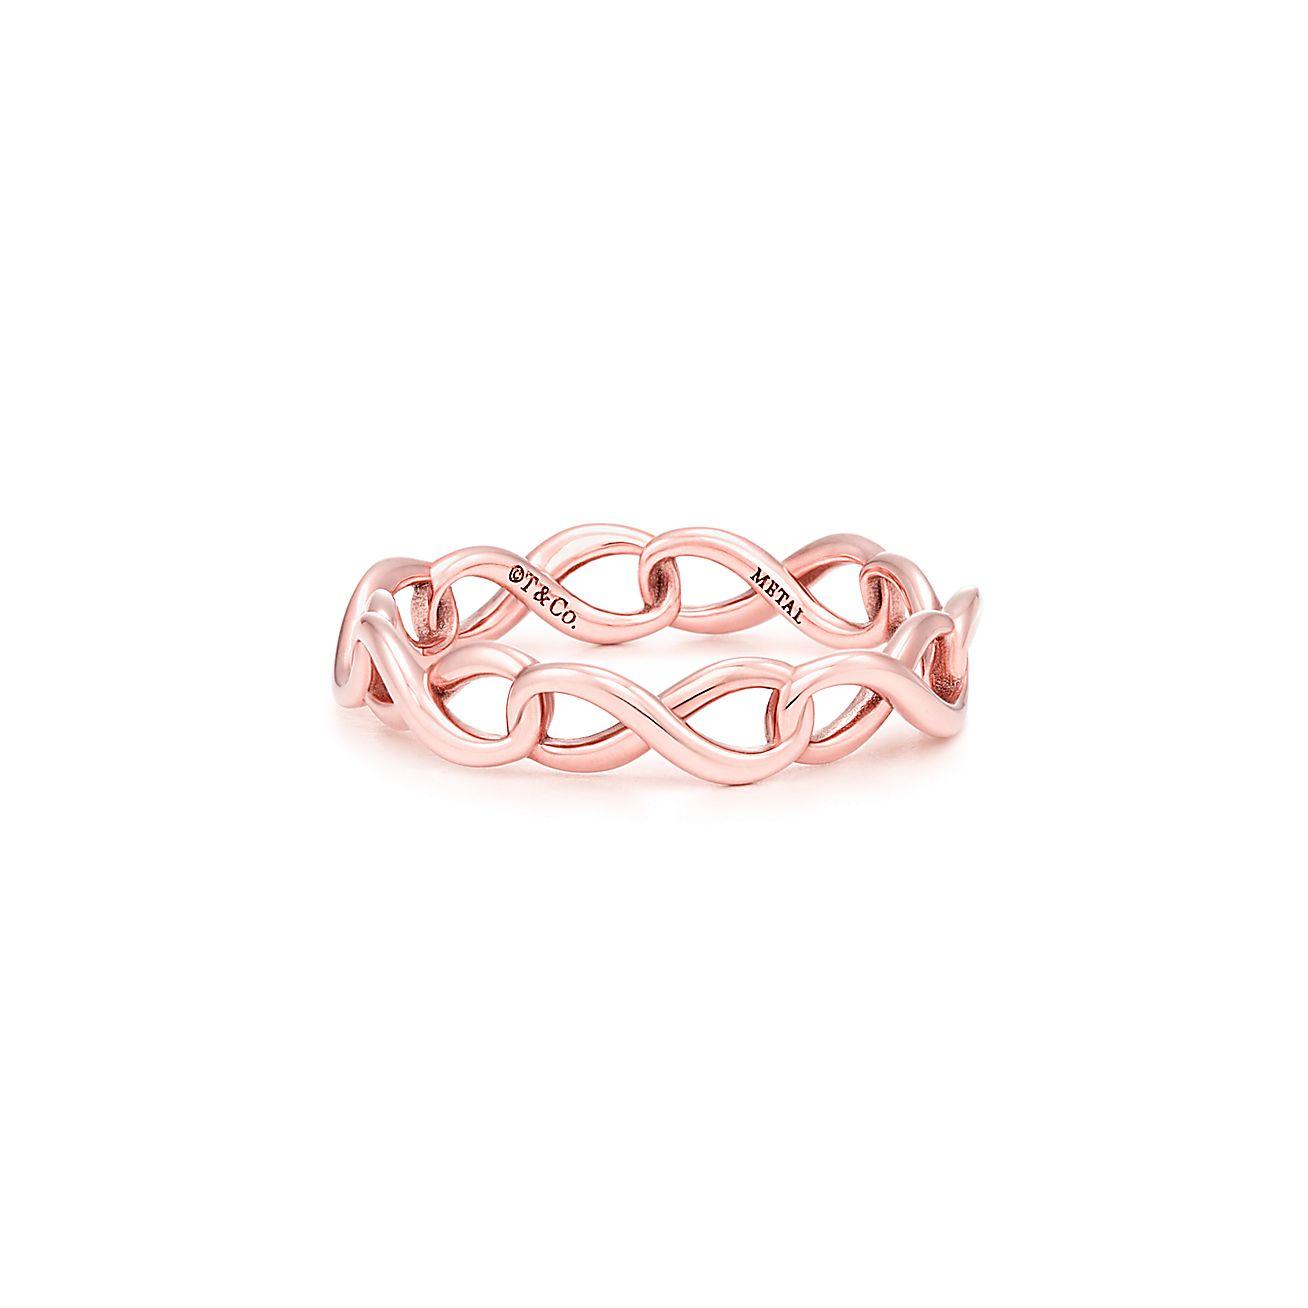 Tiffany Infinity:Band Ring